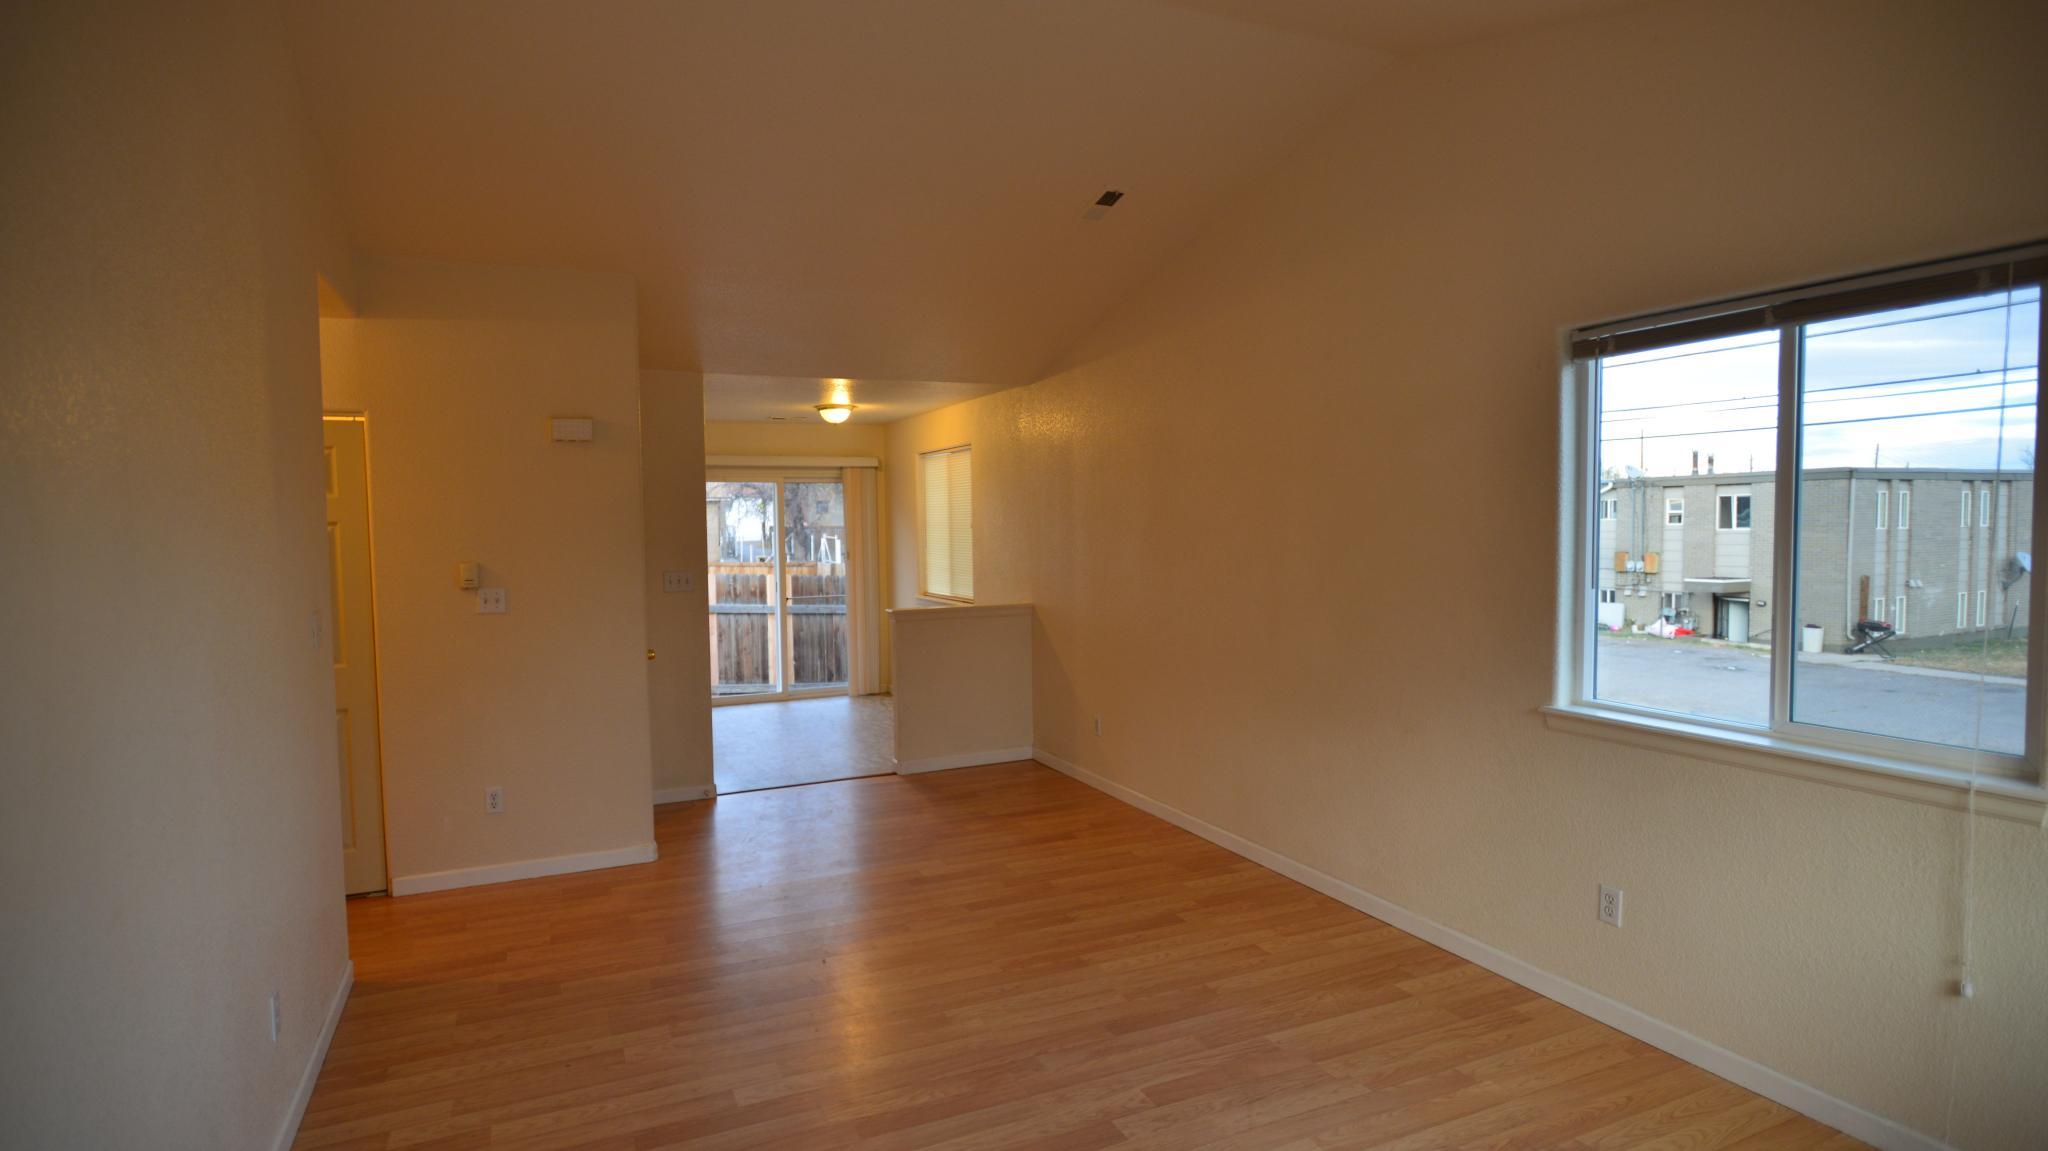 4300 Lipan St For Rent - Denver, CO | Trulia